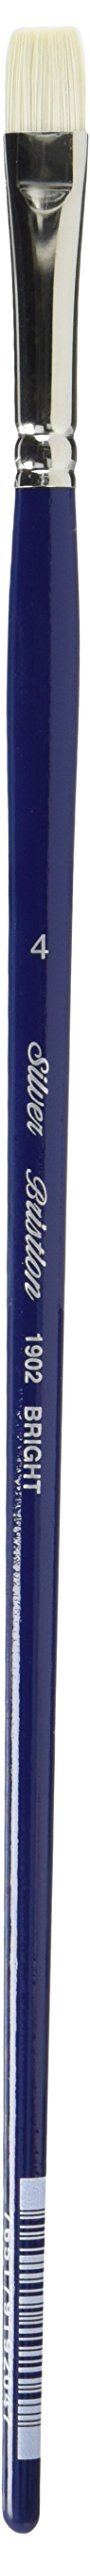 Silver Brush 1902-4 Bristlon Stiff Synthetic Long Handle Filament Brush, Bright, Size 4